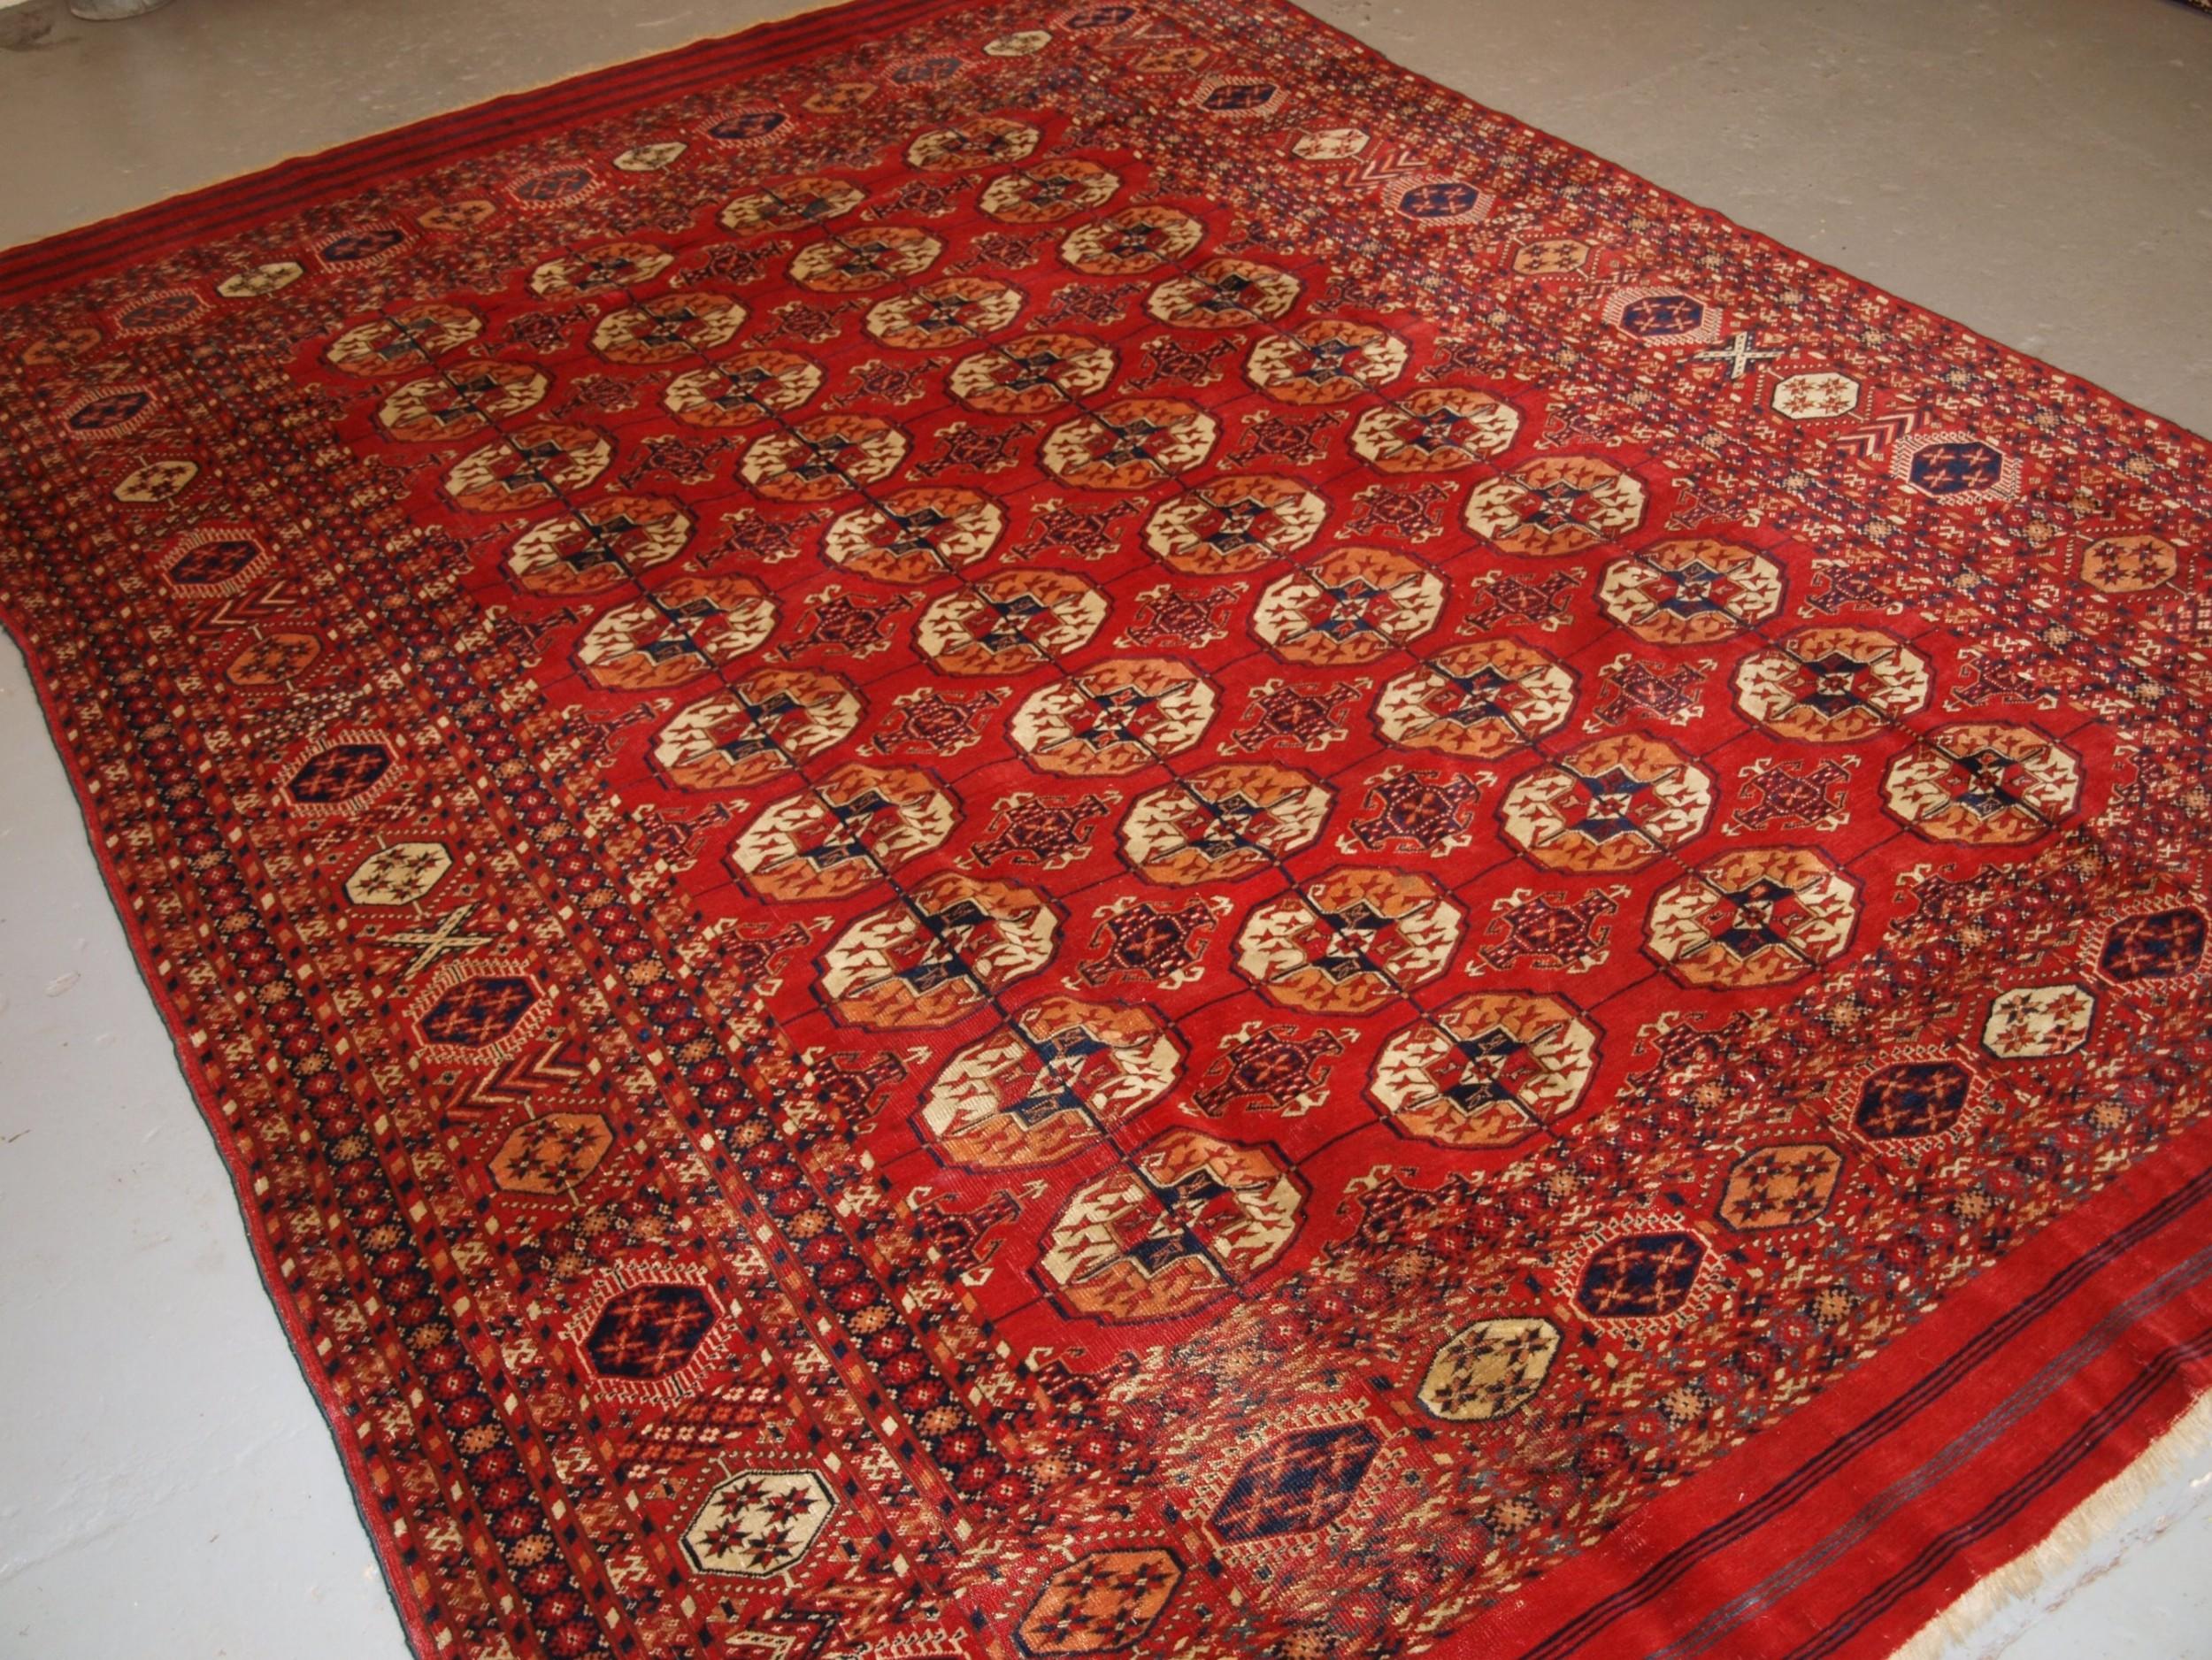 antique tekke turkmen main carpet unusual piled elem end panels 4th quarter 19th century